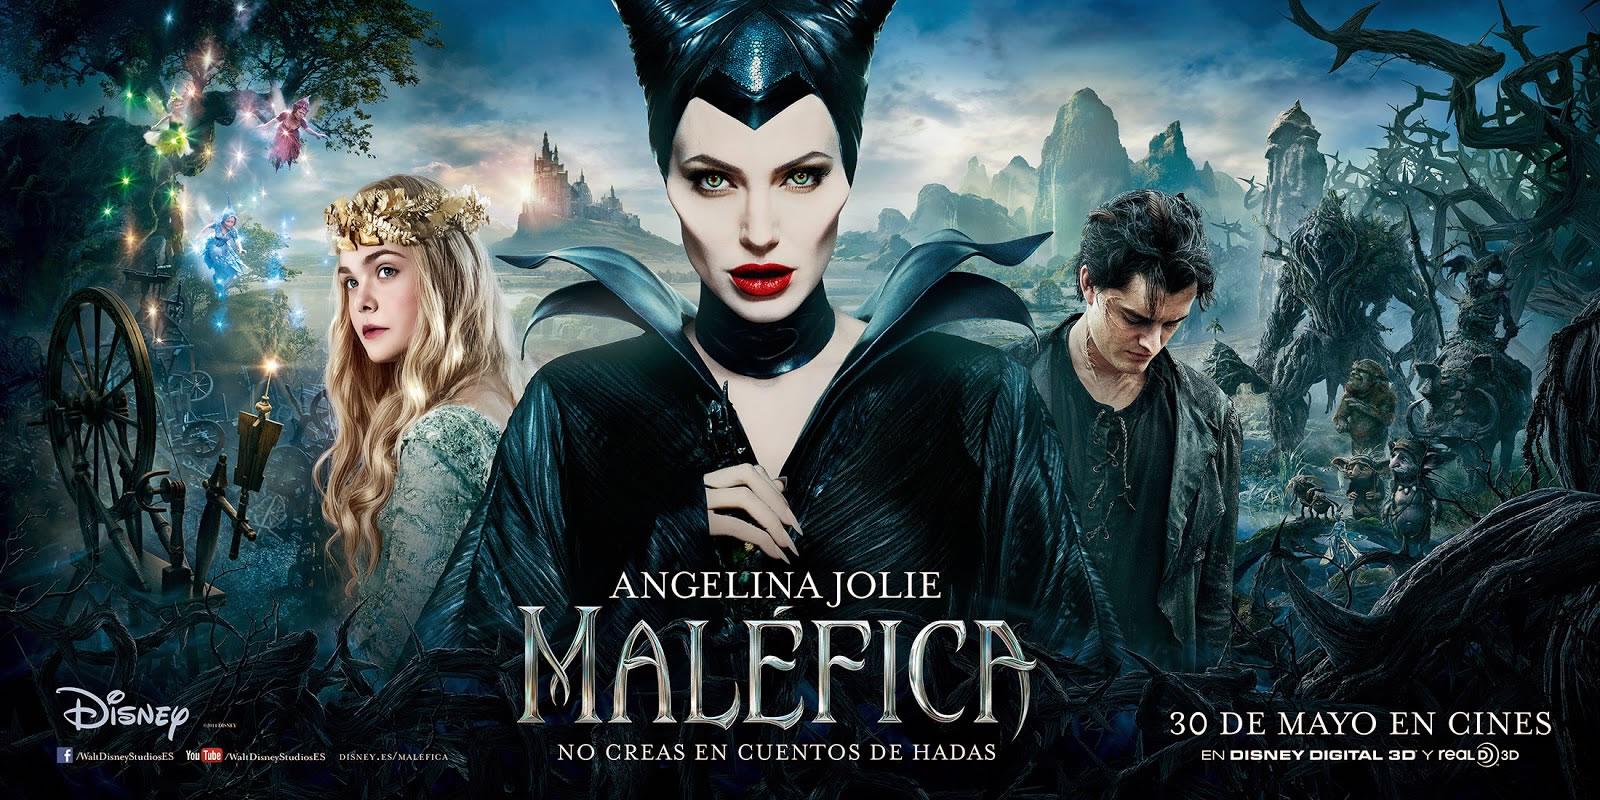 Malevola-banner-04abr2014-01